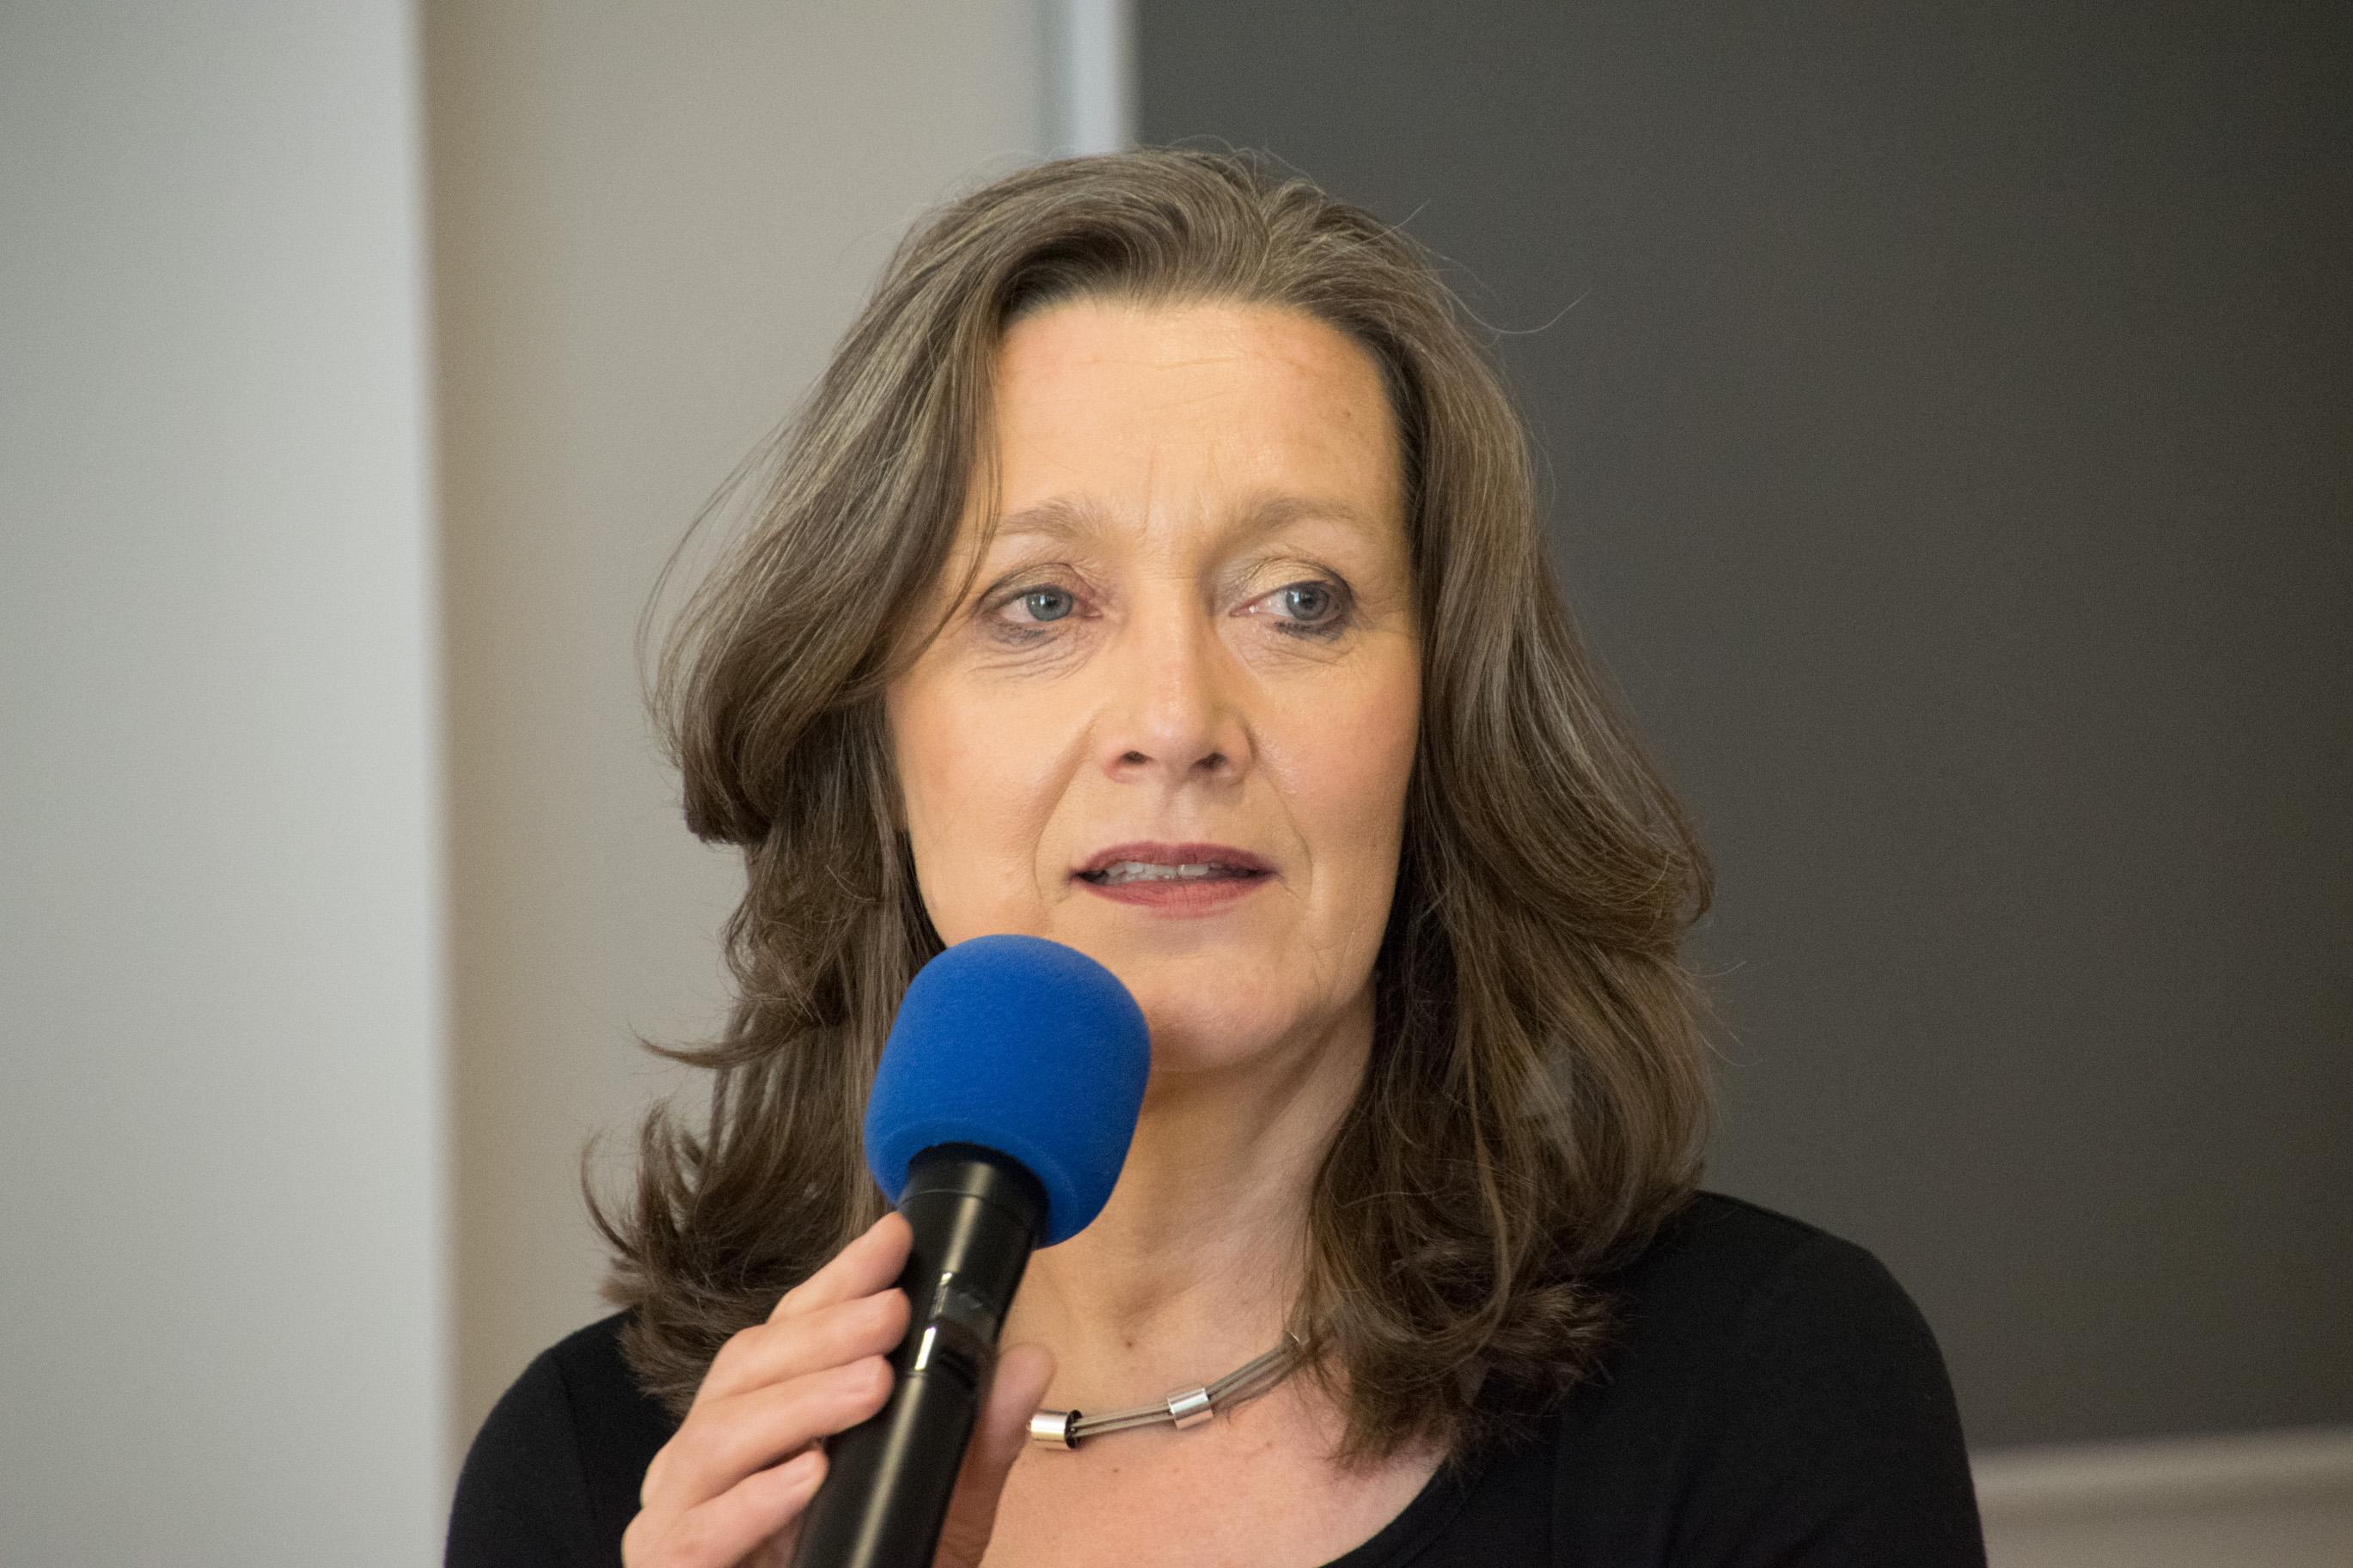 Patientenanwältin Dr. Sigrid Pilz